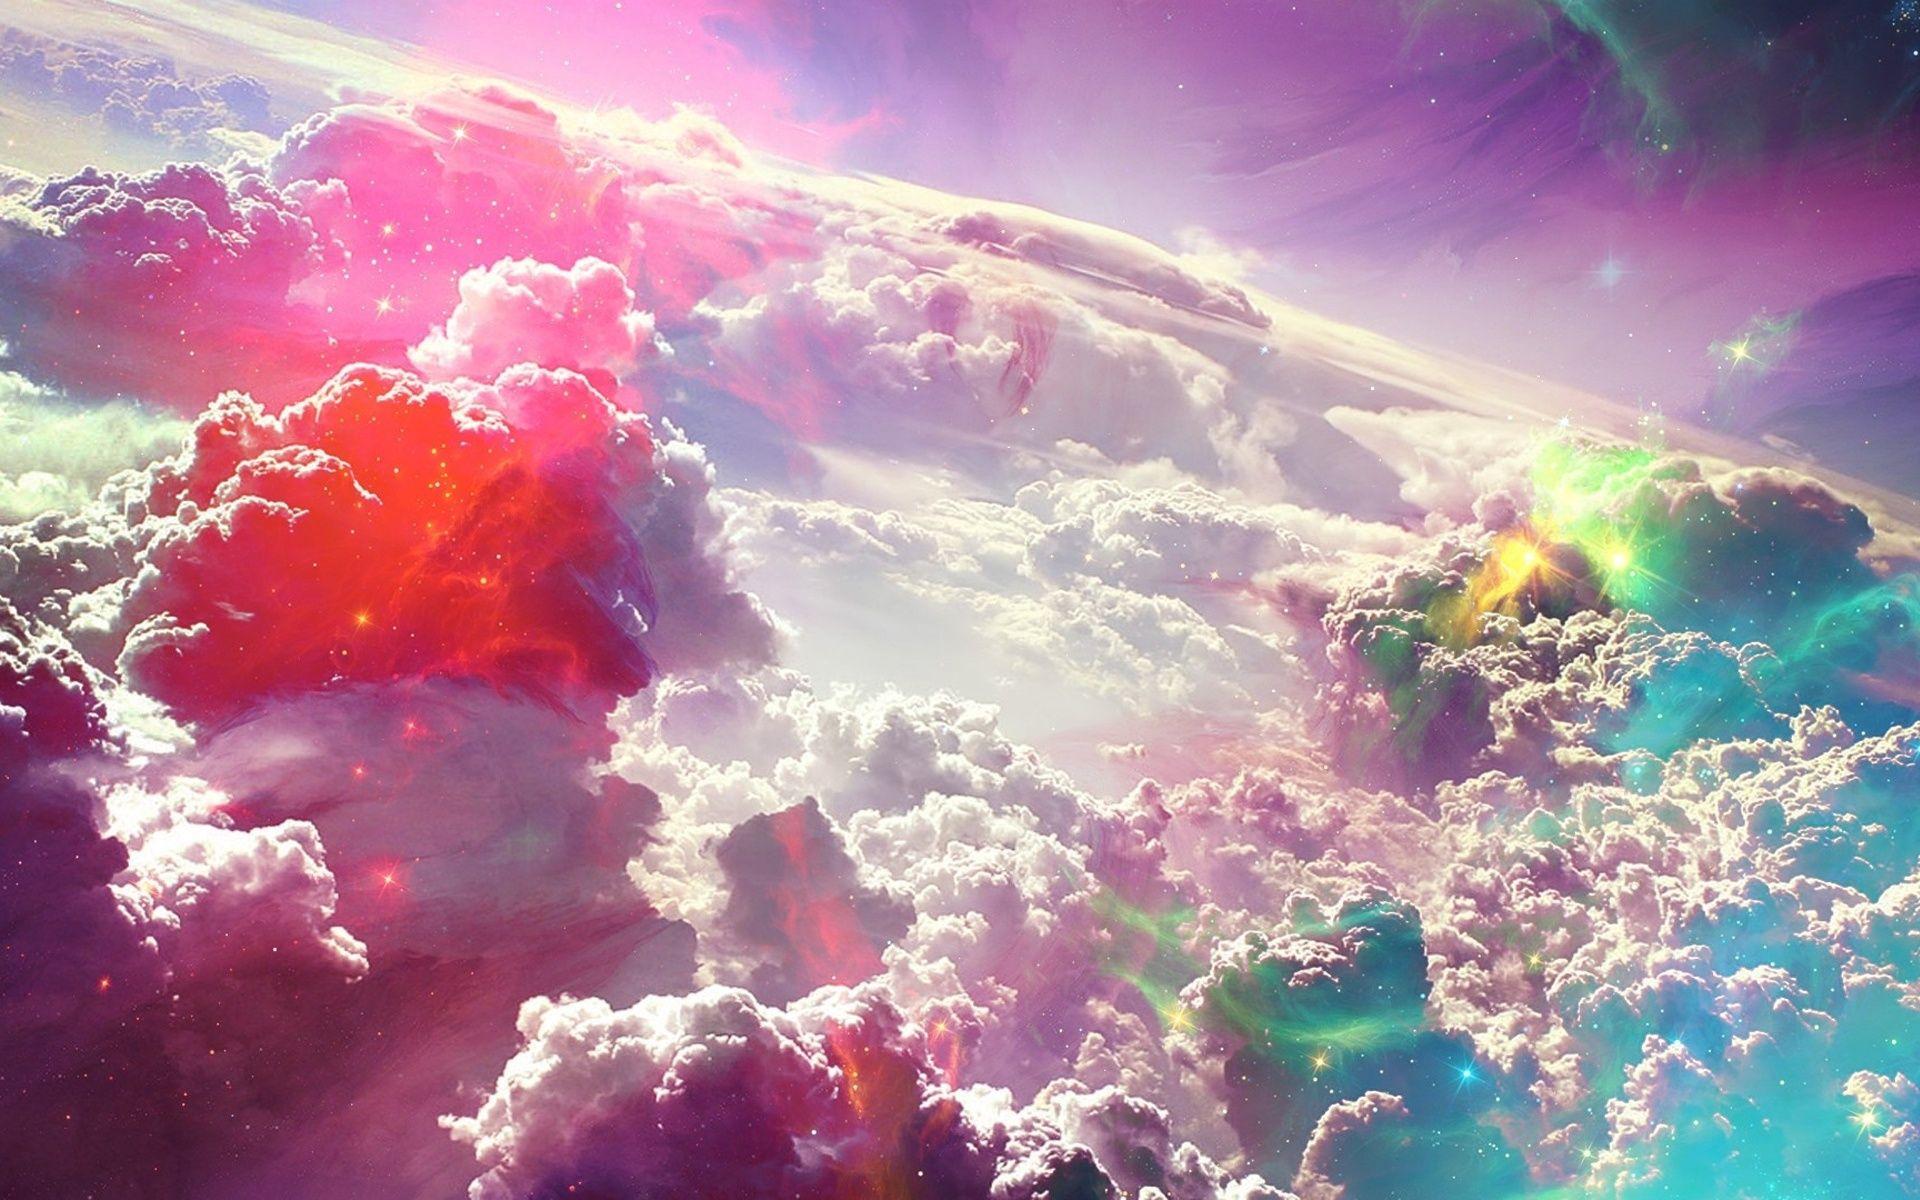 clouds wallpaper | colorful fantasy clouds art wallpaper | sky